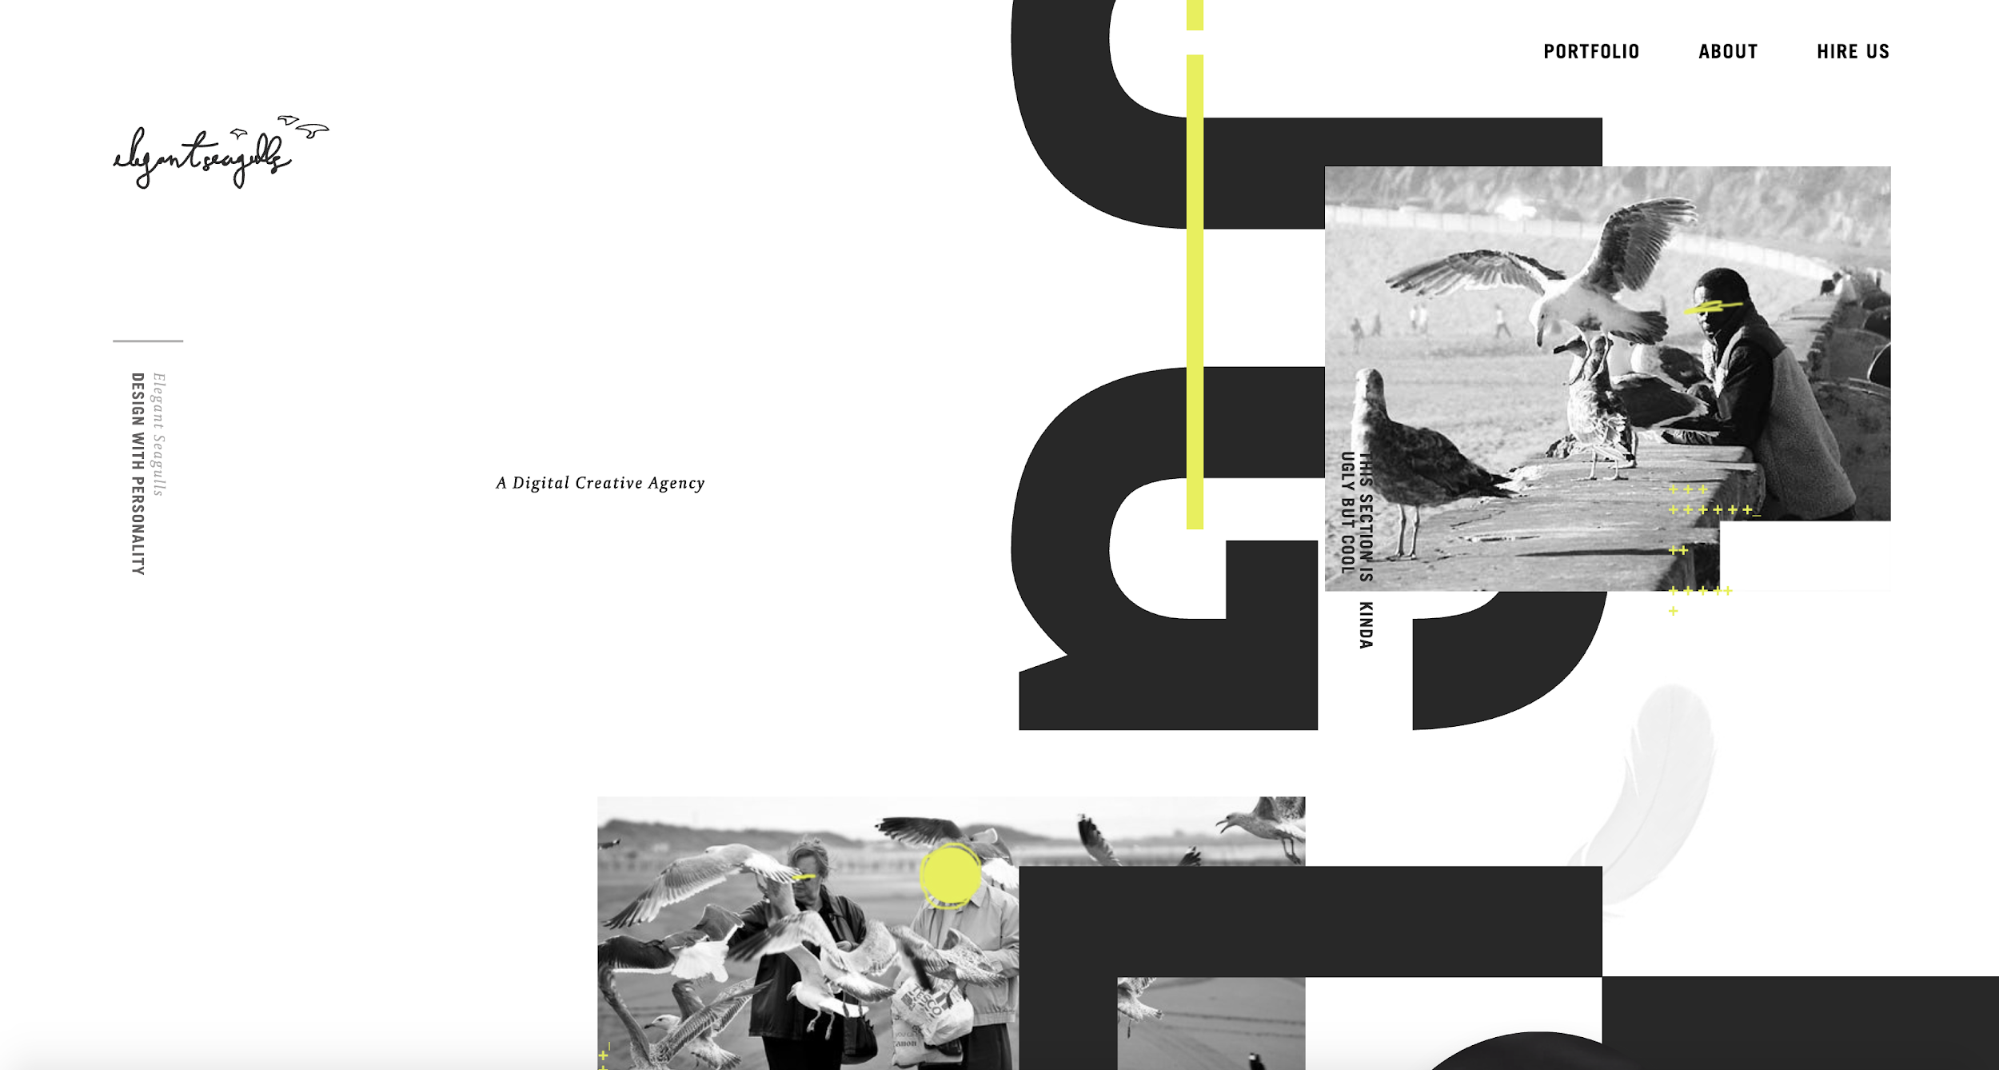 7 typography trends in web design | Webflow Blog